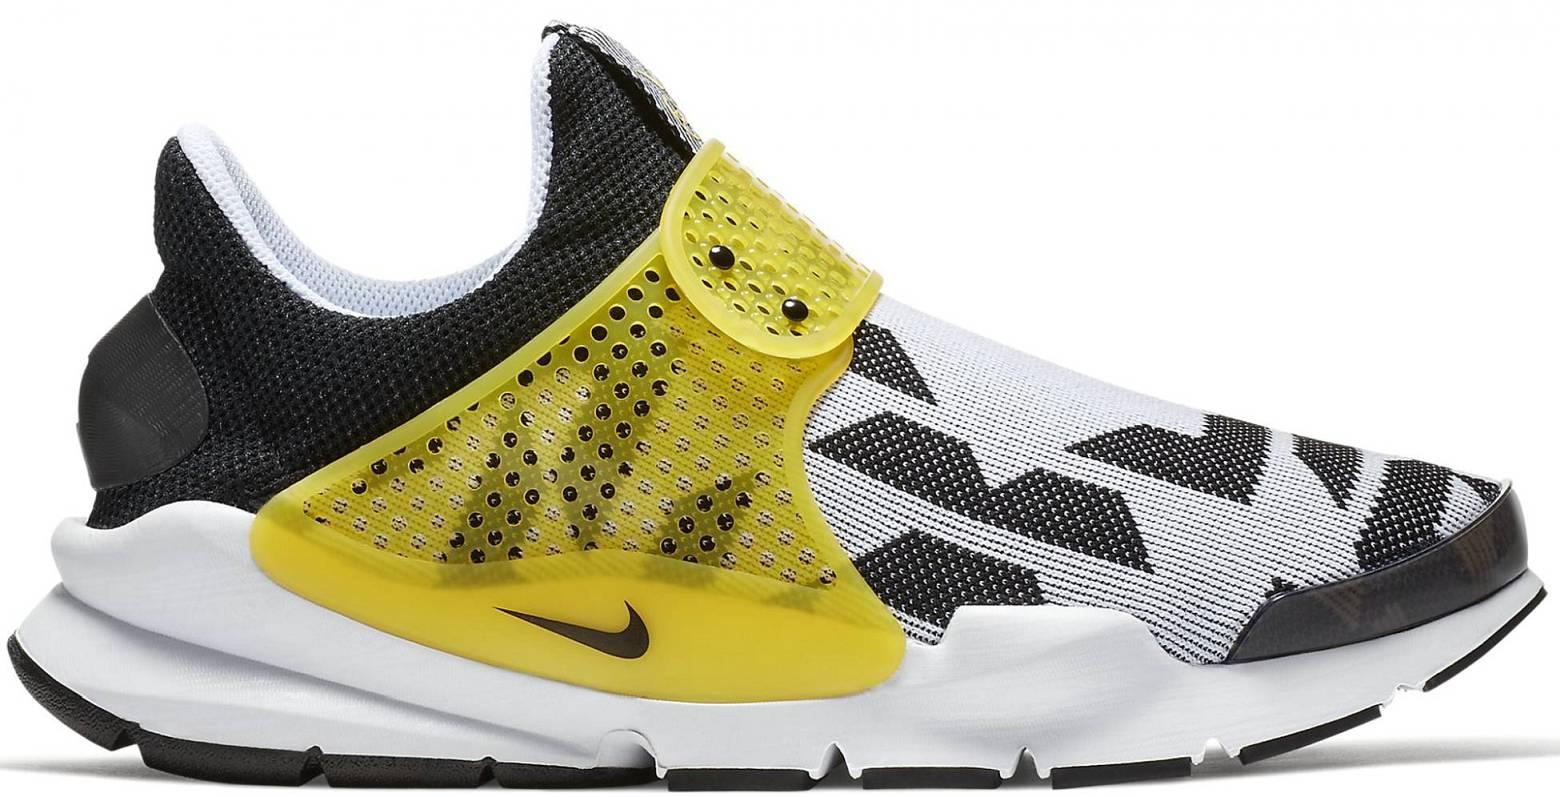 Nike Sock Dart GPX N7 – Shoes Reviews